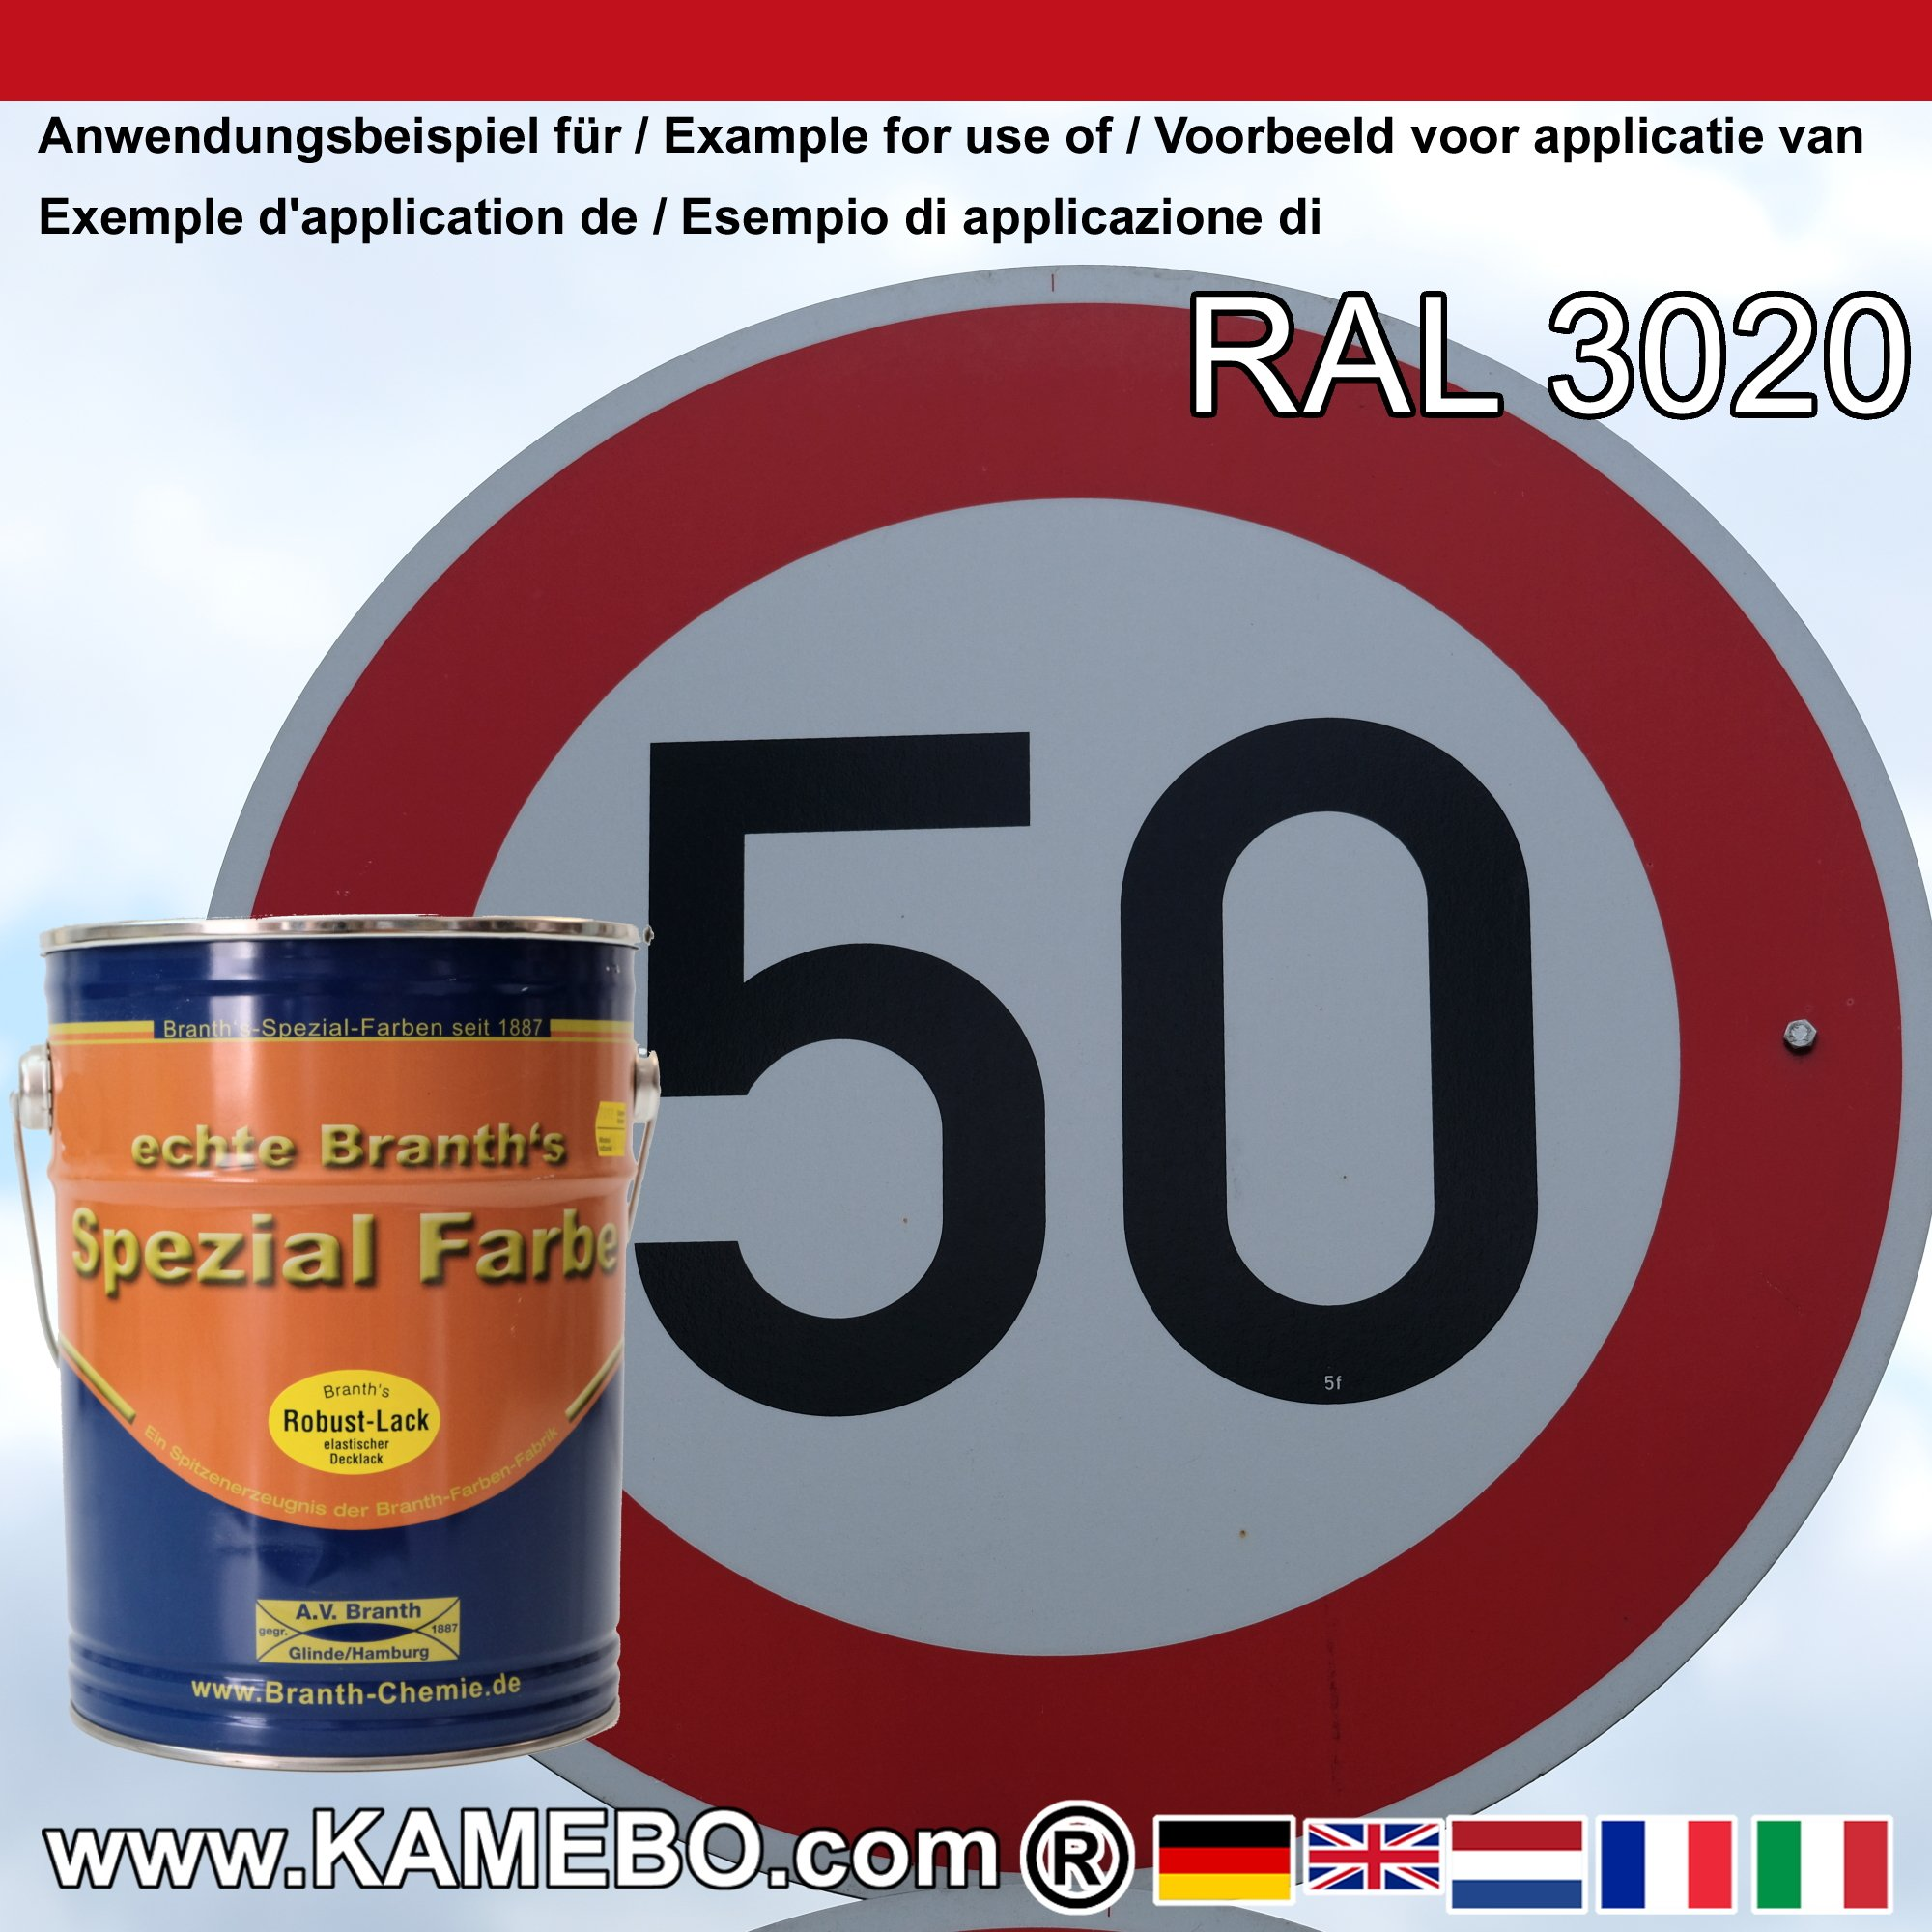 branth's robust lack metallschutzlack ral 3020 verkehrsrot 5 liter